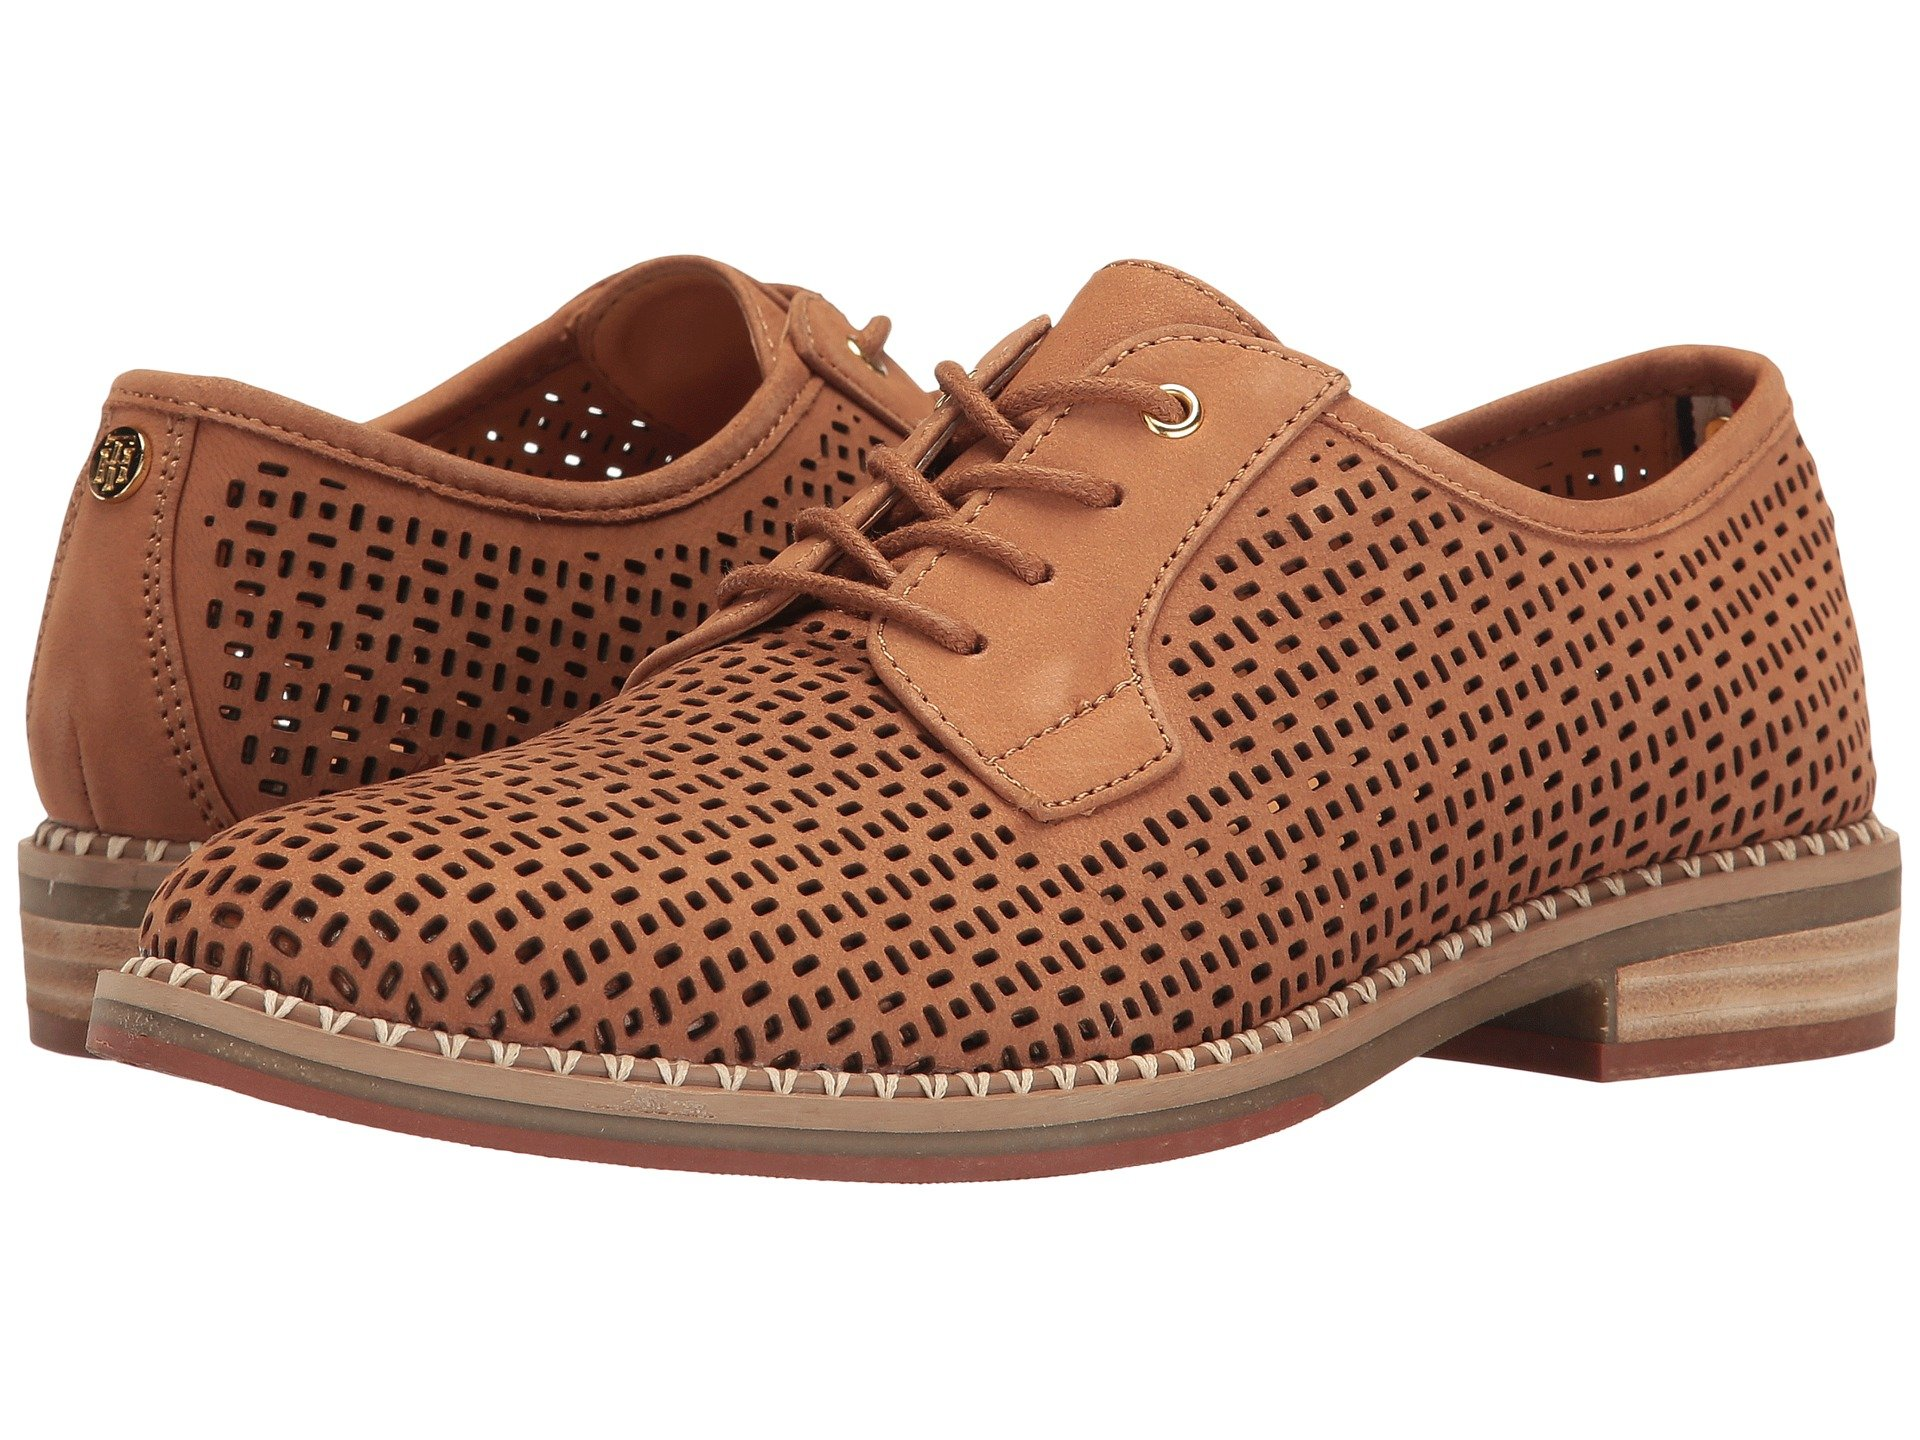 Zapato Casual para Mujer Tommy Hilfiger Raenay  + Tommy Hilfiger en VeoyCompro.net